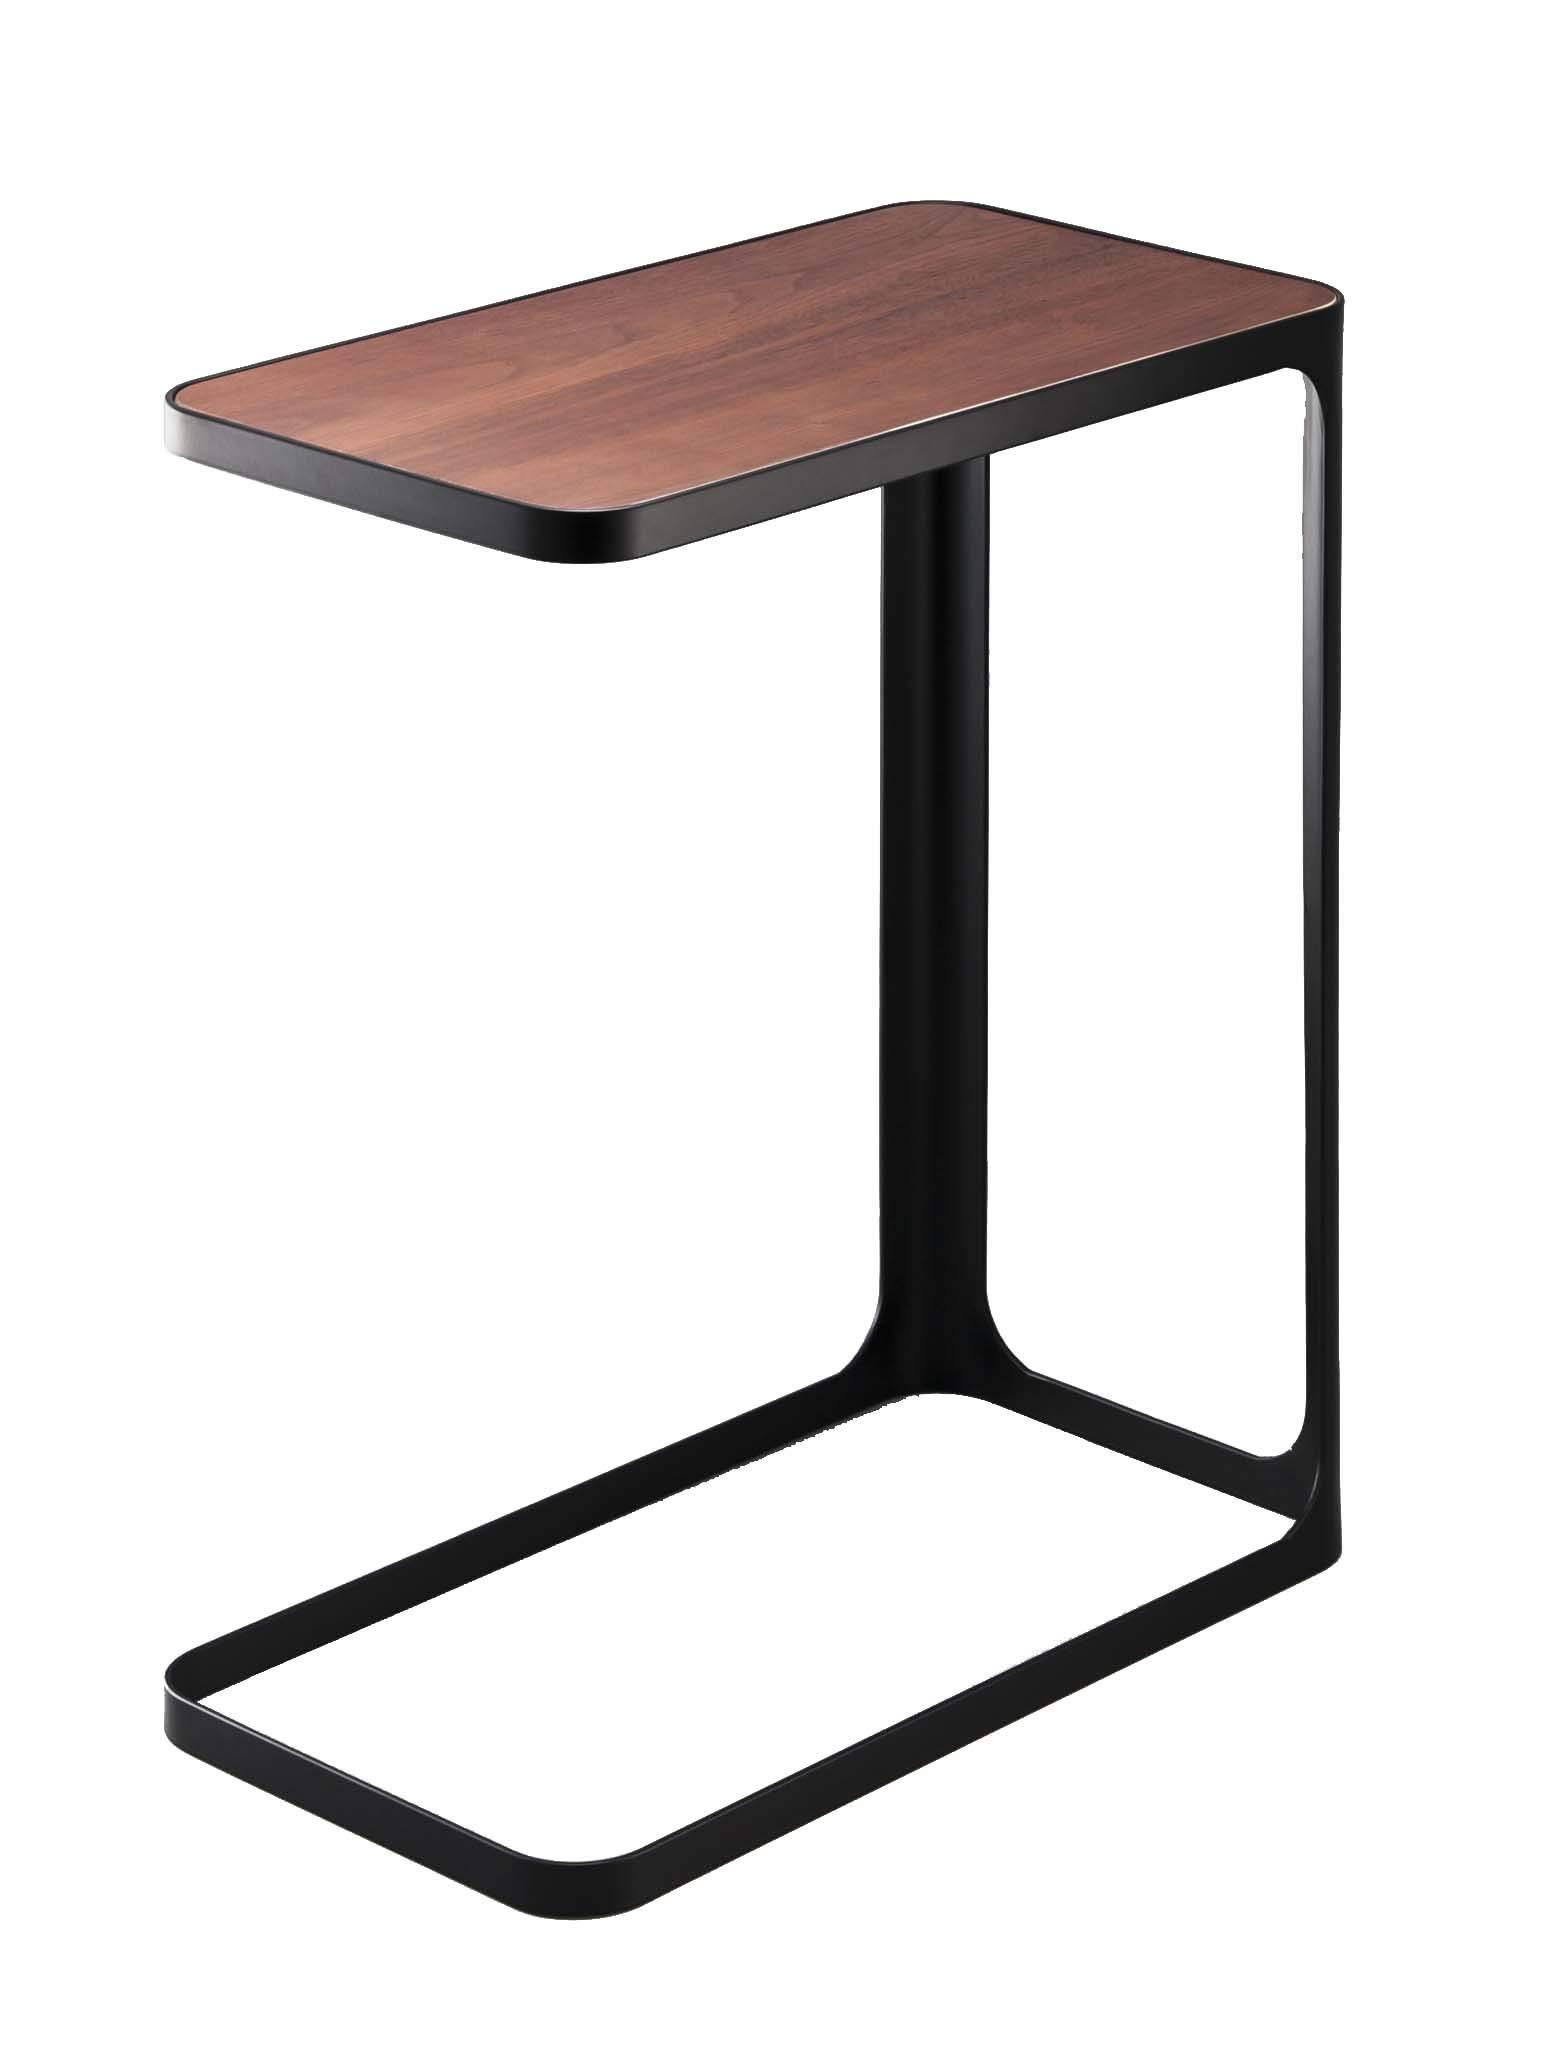 YAMAZAKI home Compact Tower Side Table, Black by YAMAZAKI home